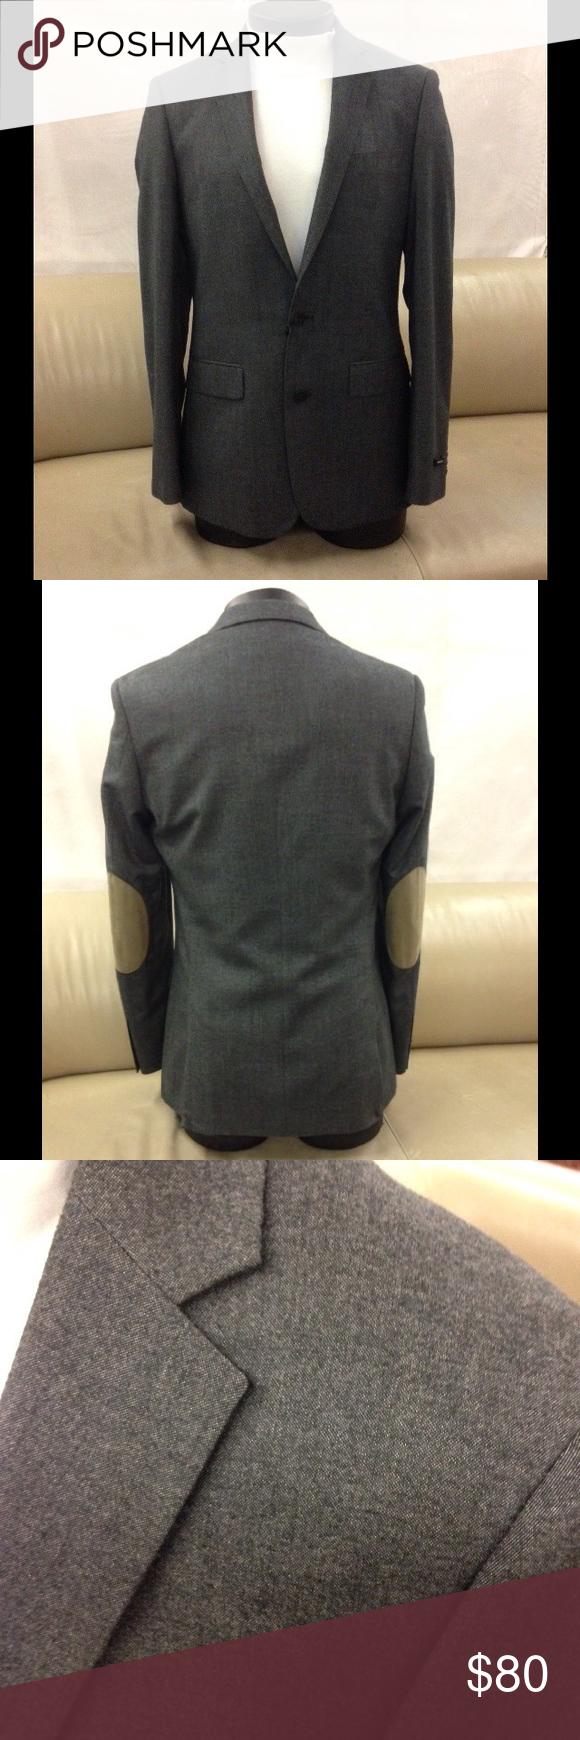 Men's Elbow Patch Sports Jacket NWT Jackets, Sports jacket